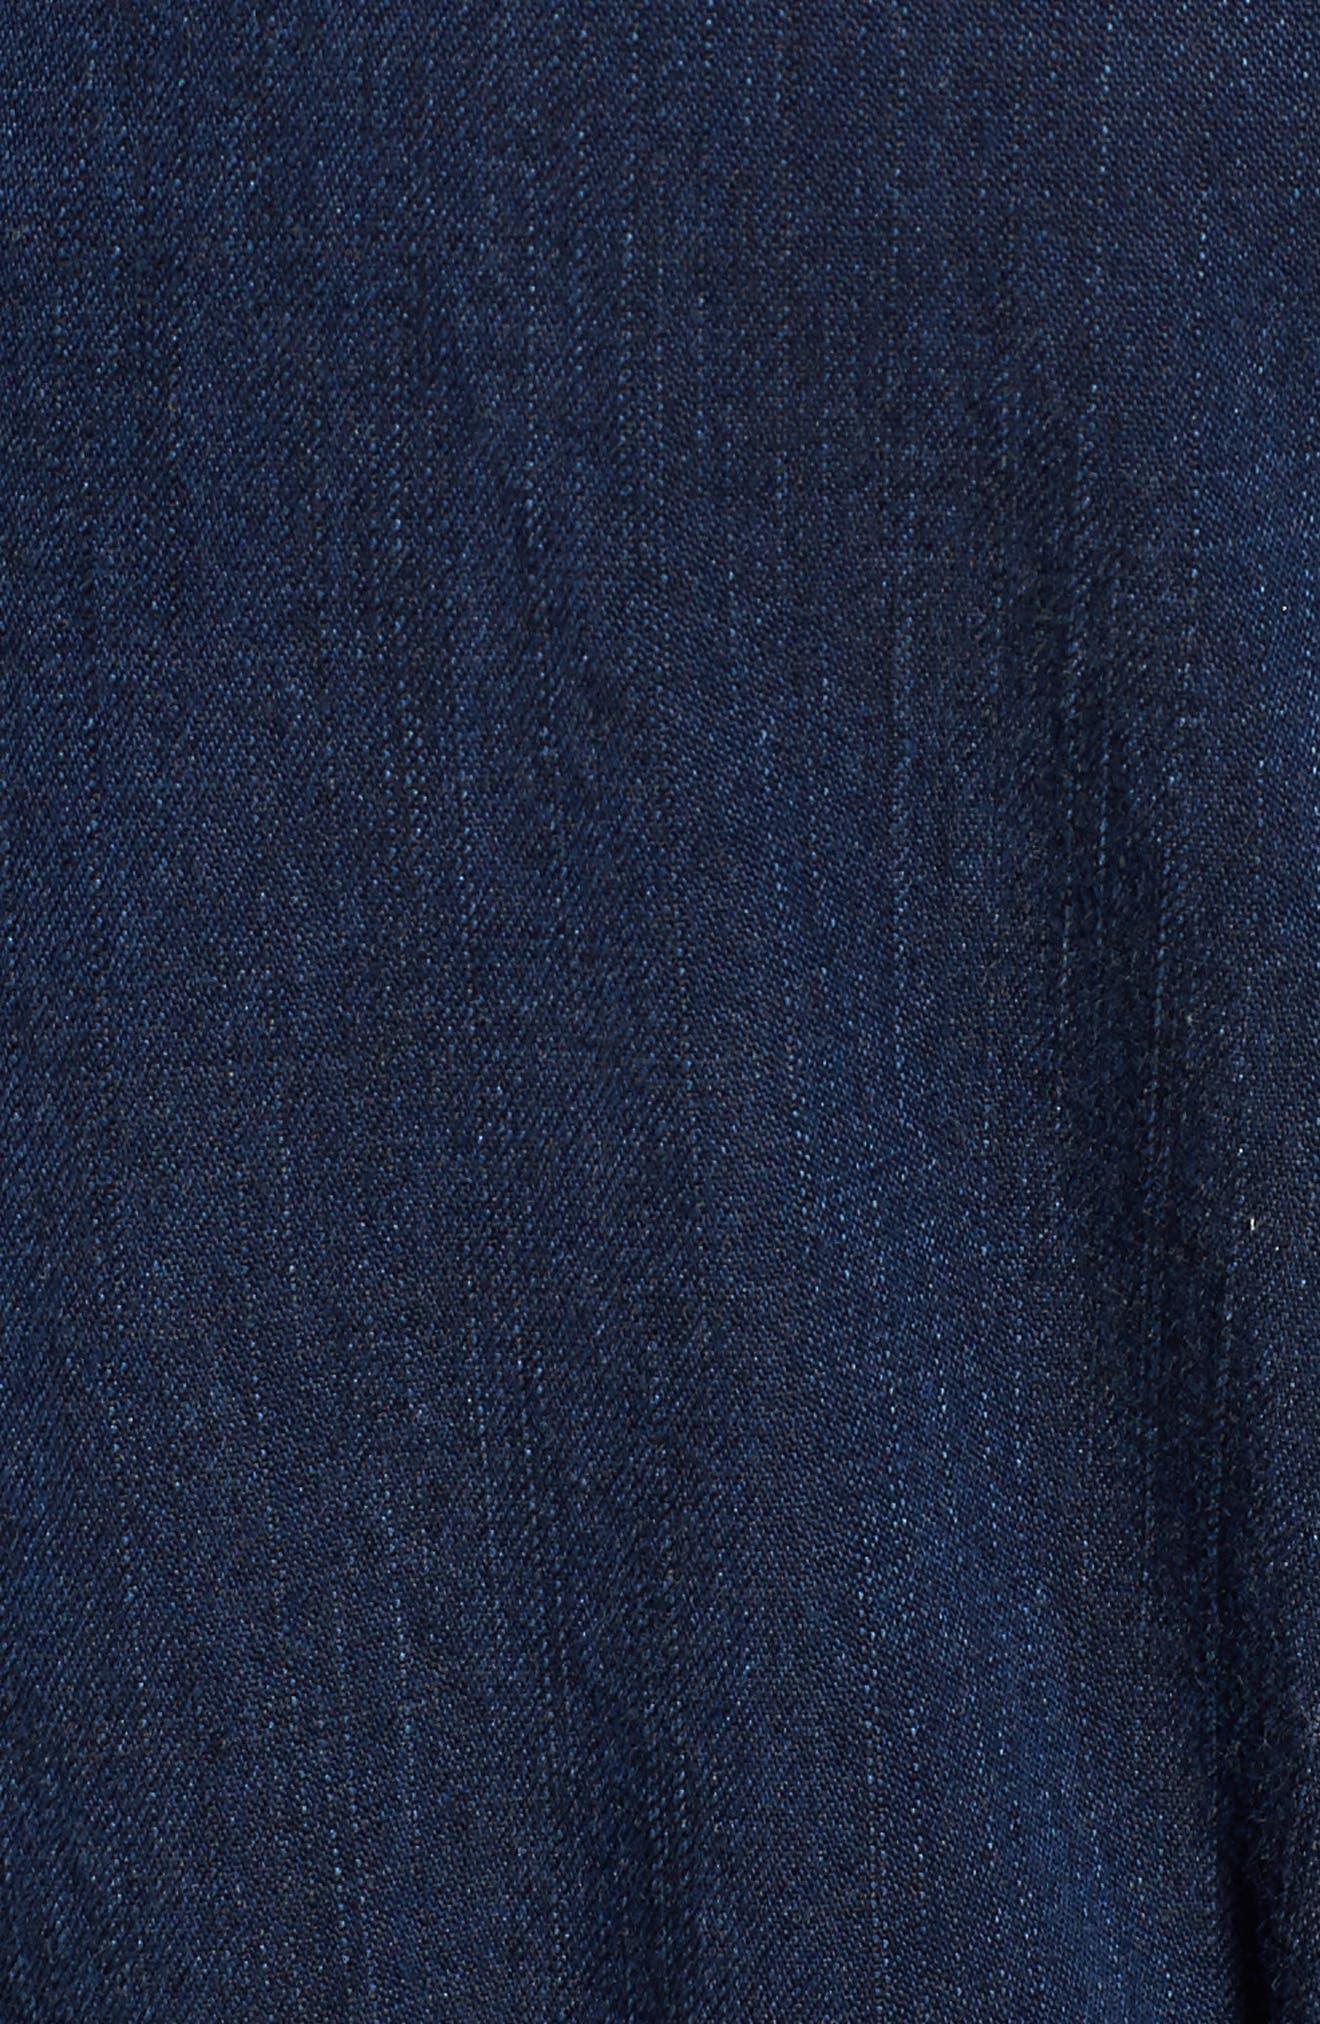 Denim Shirtdress,                             Alternate thumbnail 5, color,                             419